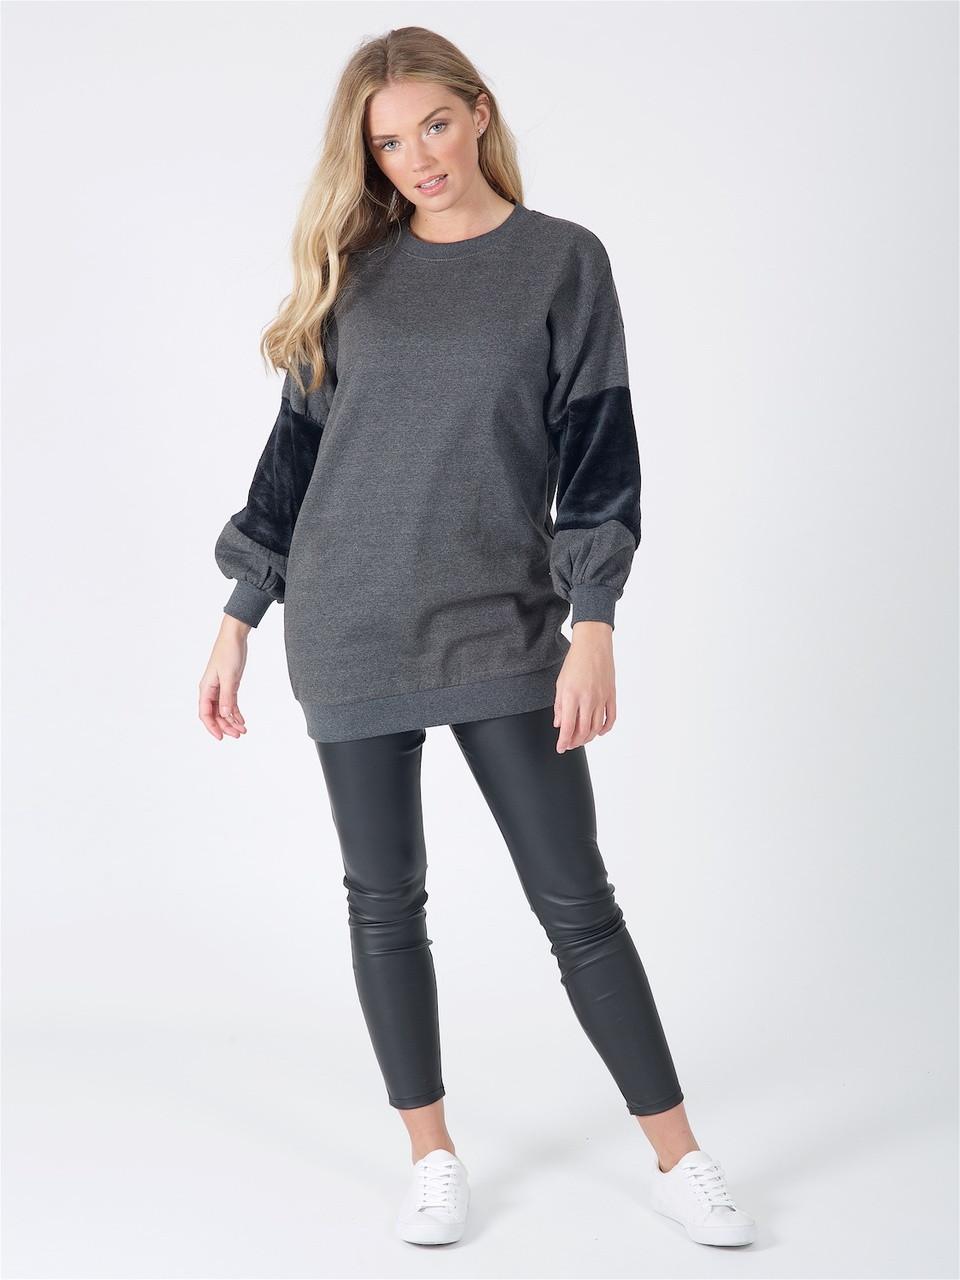 Charcoal Oversized Fur Sleeve Jumper